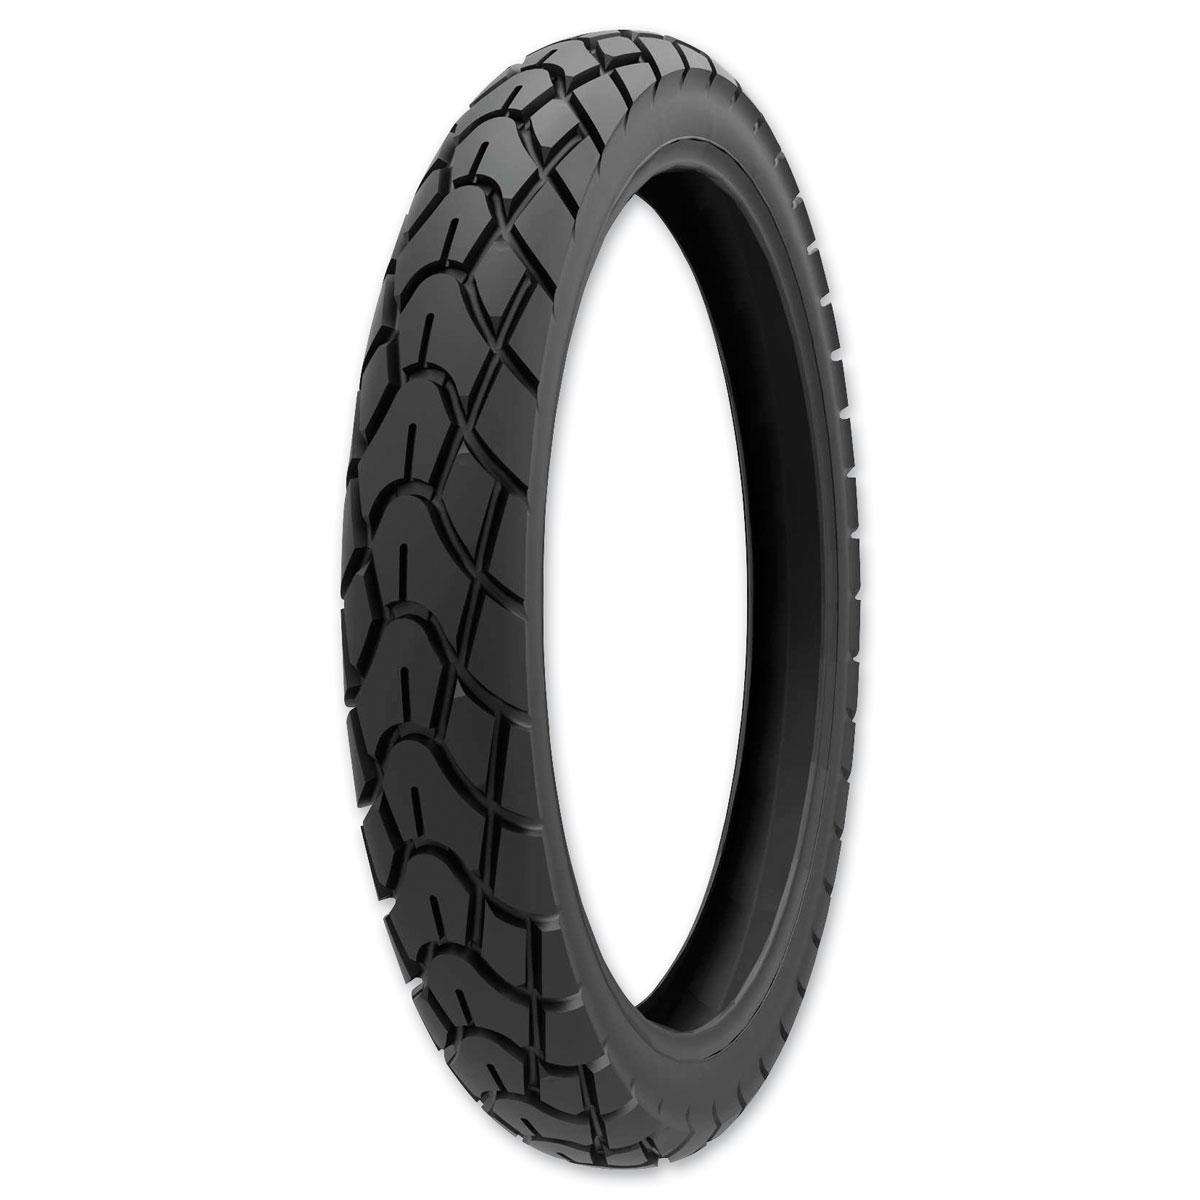 Kenda Tires K761 90/90-21 Front/Rear Tire